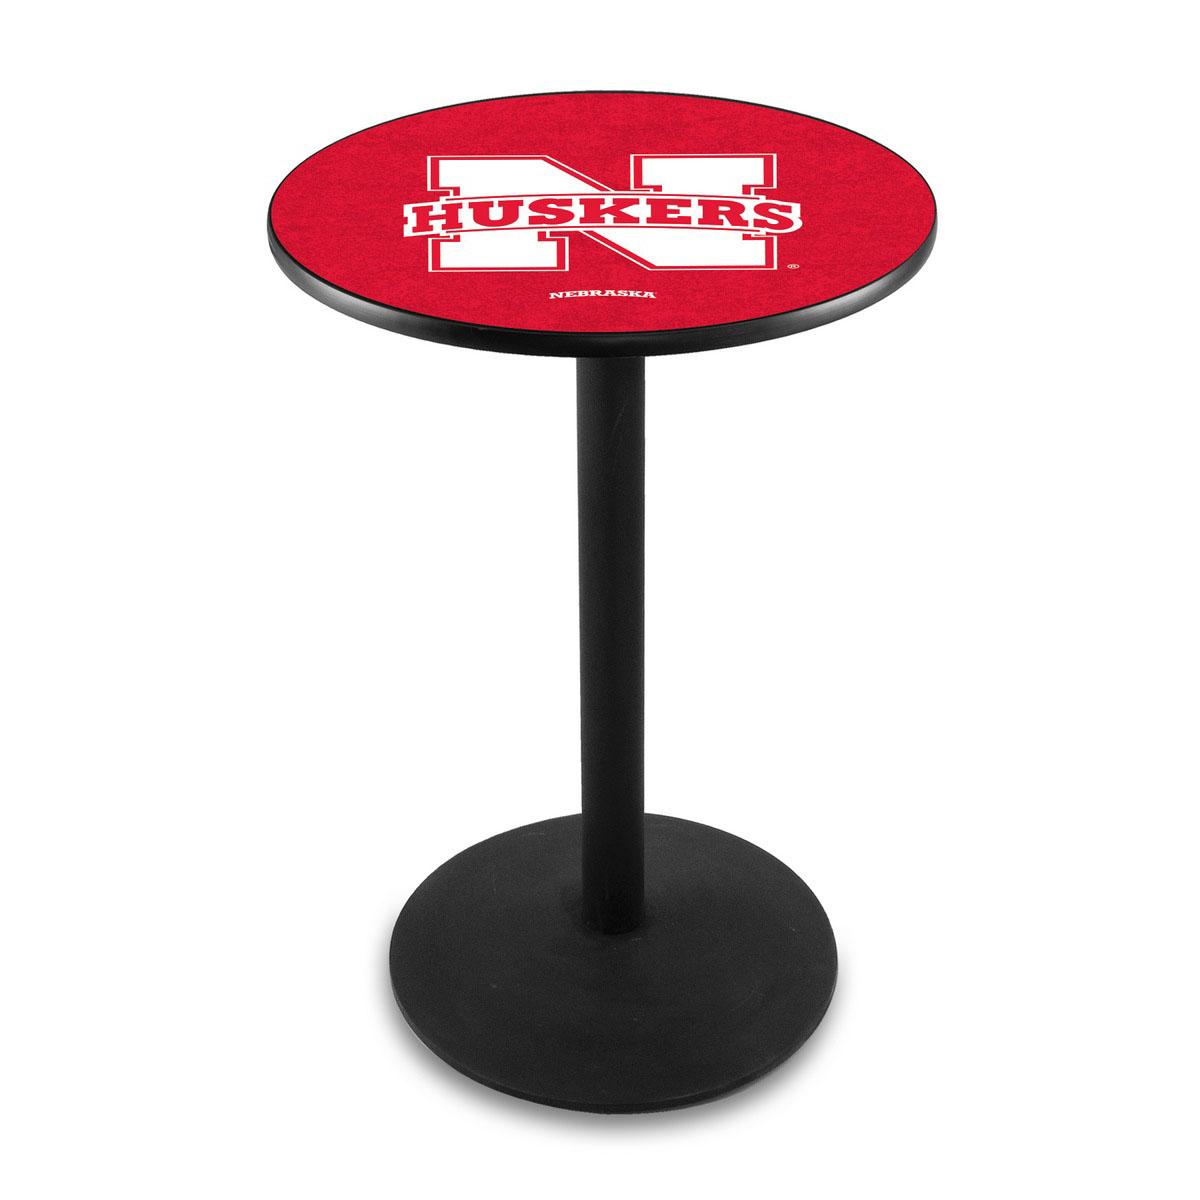 Popular University Nebraska Logo Pub Bar Table Round Stand Product Photo